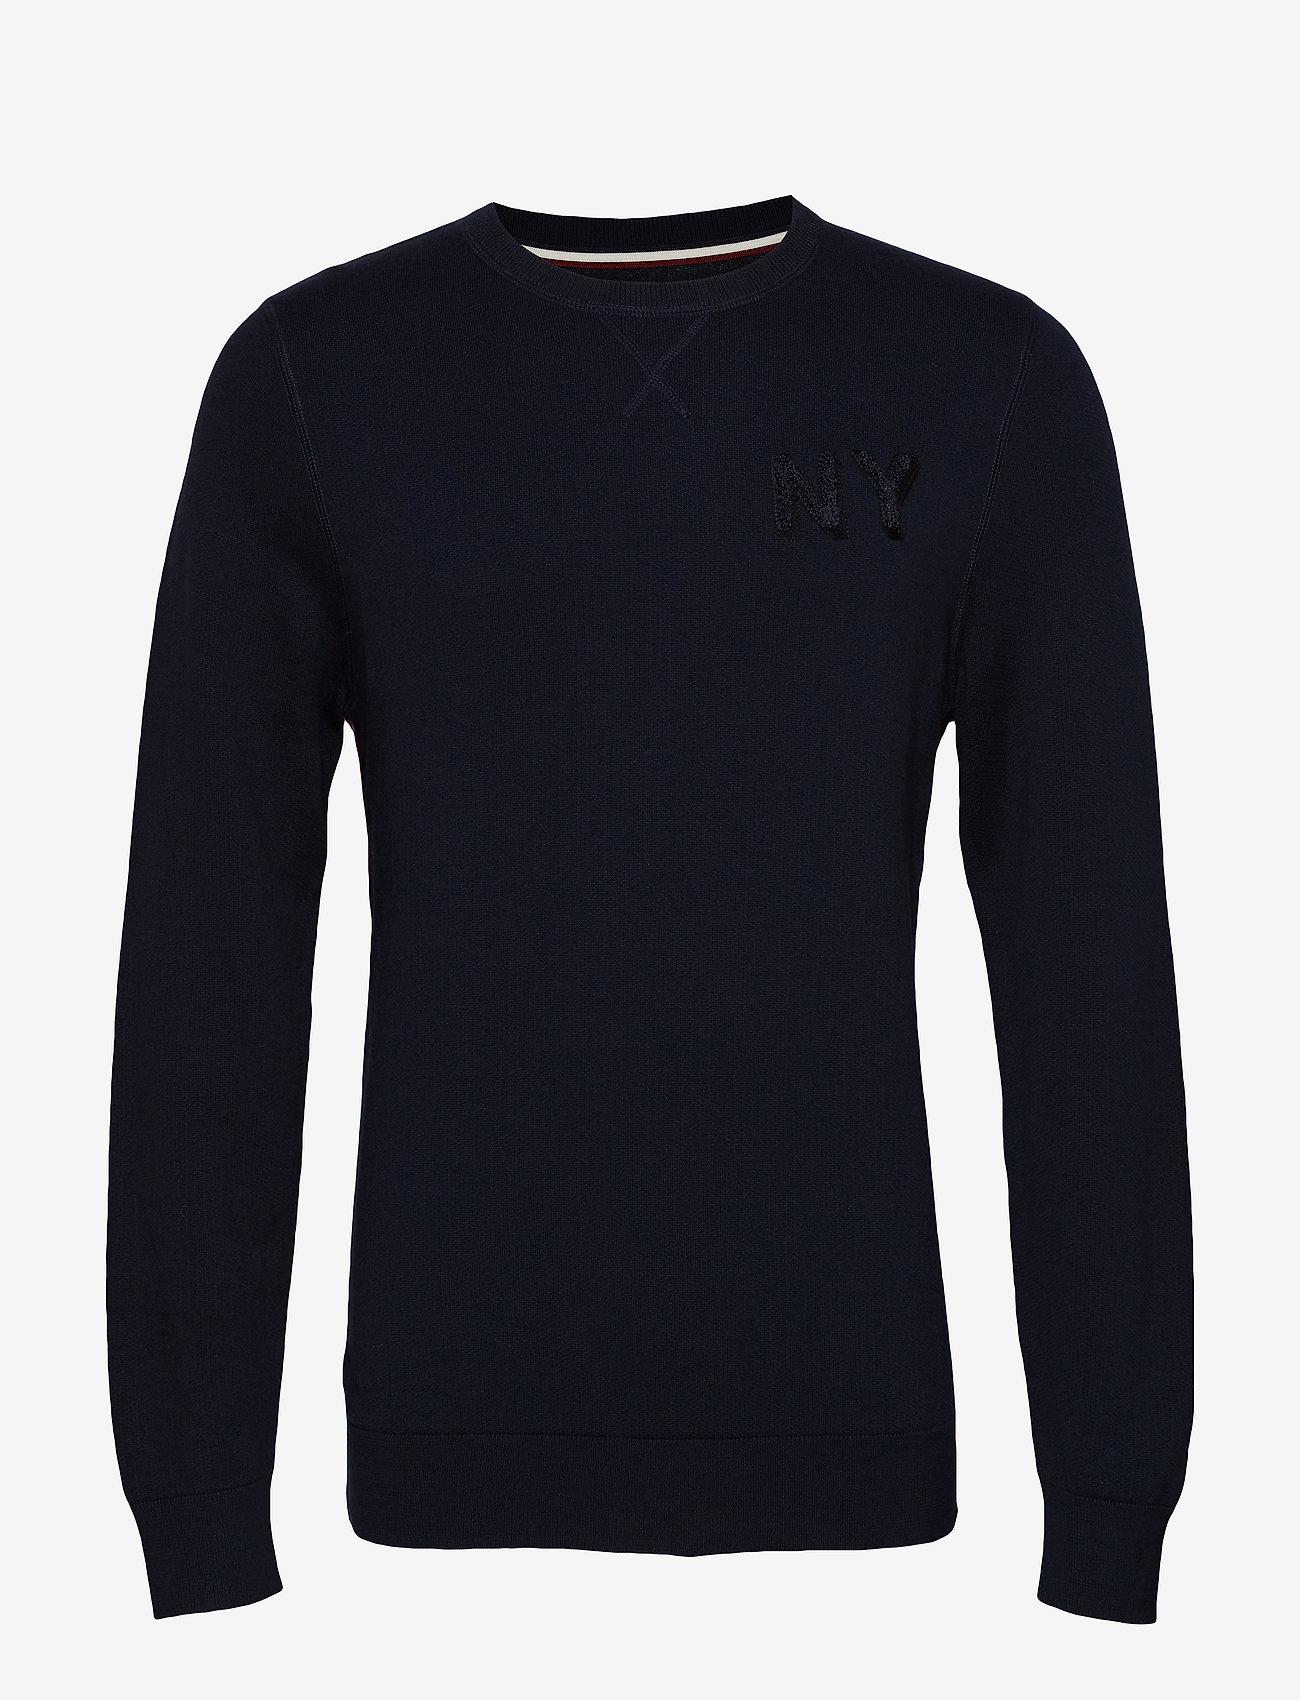 Lindbergh - Signature knit - tricots basiques - navy - 1